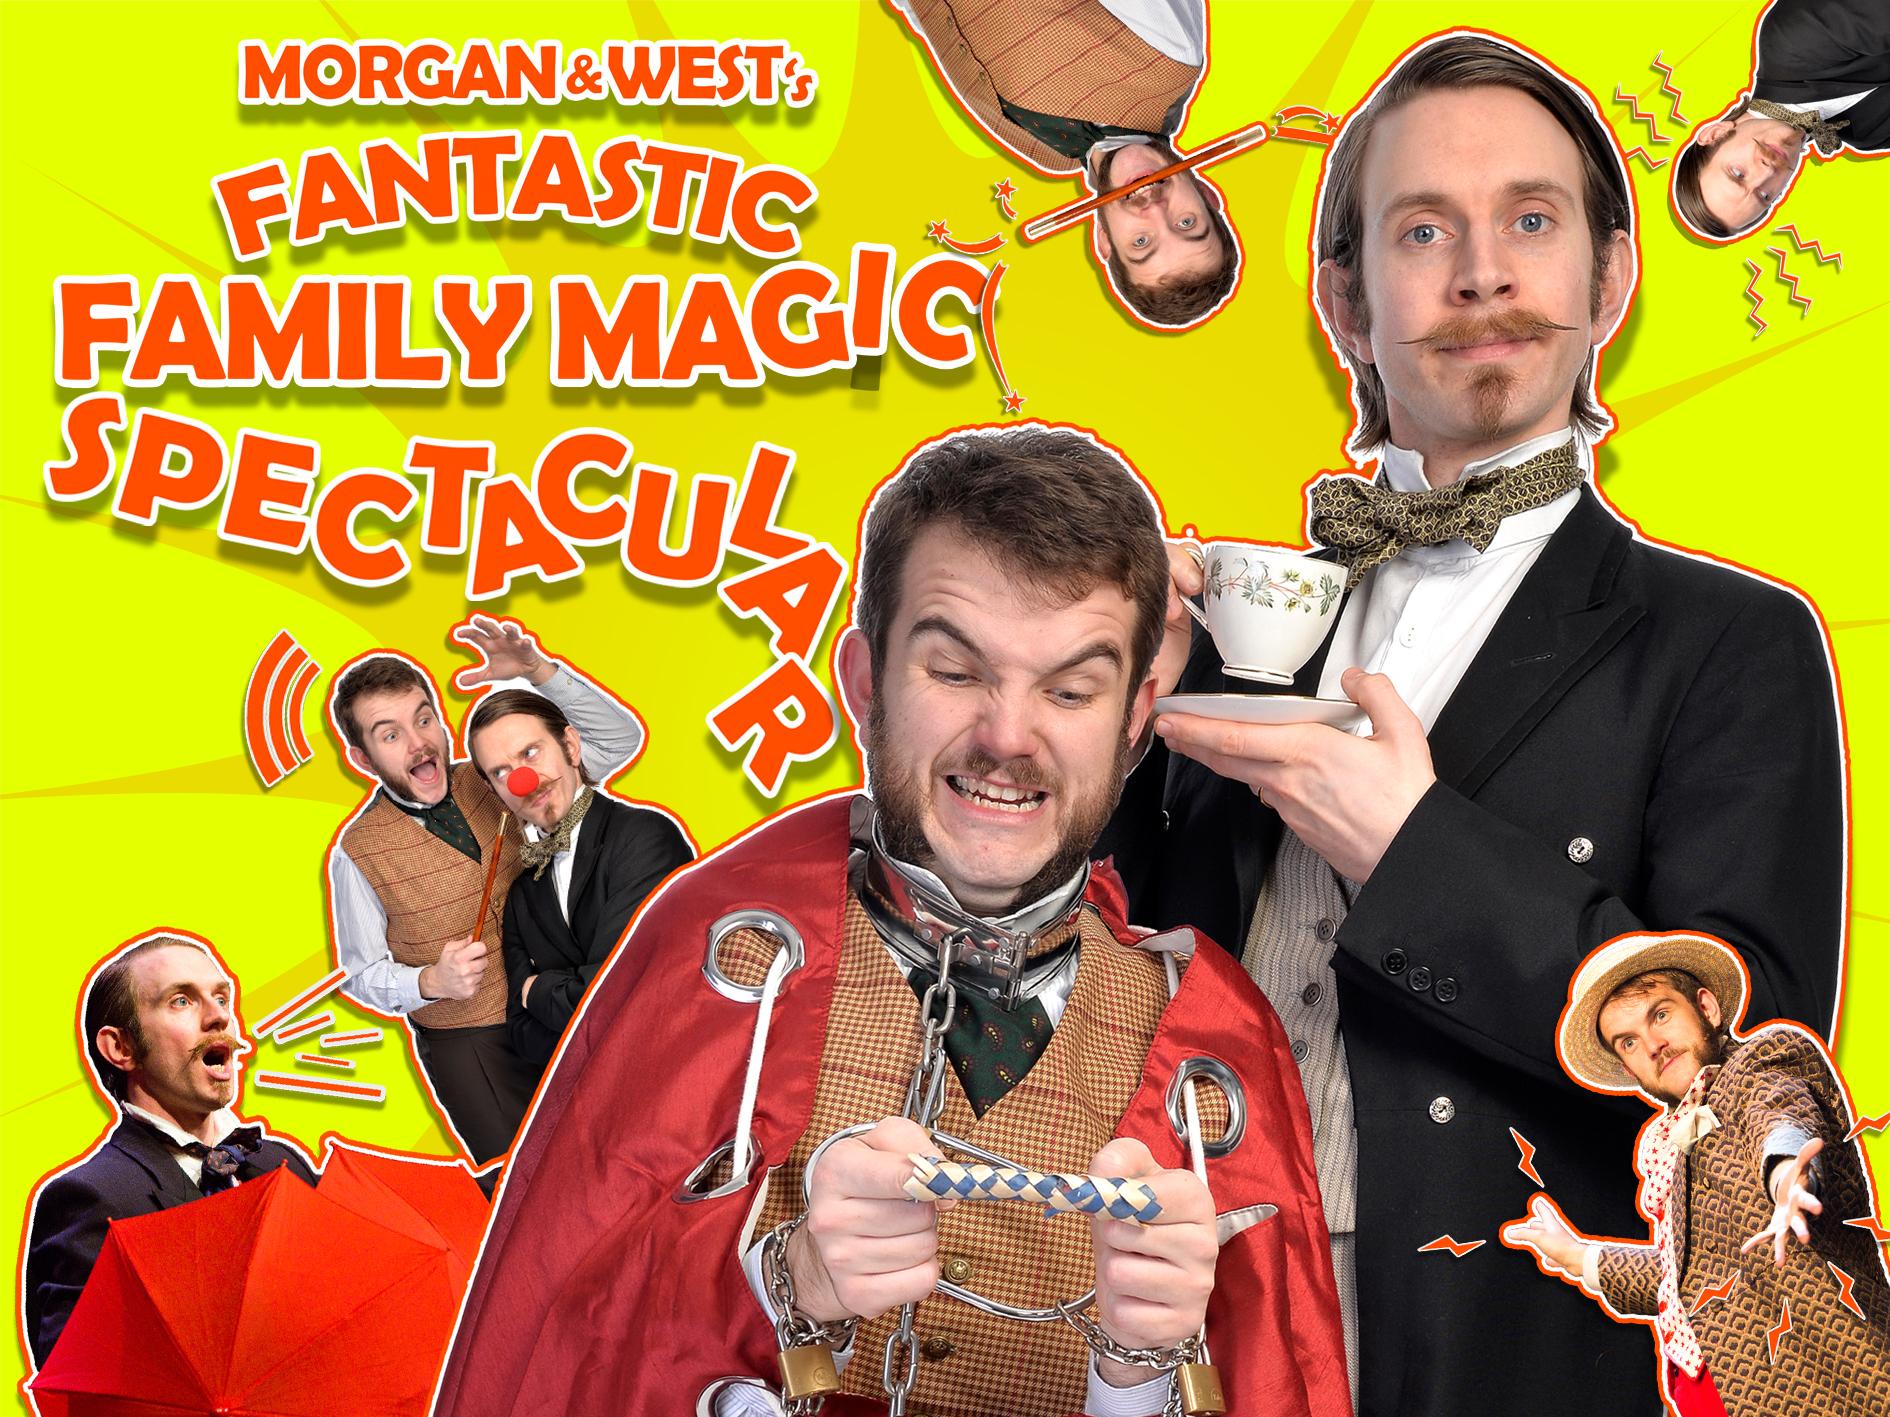 Morgan & Wests' Fantastic Family Show